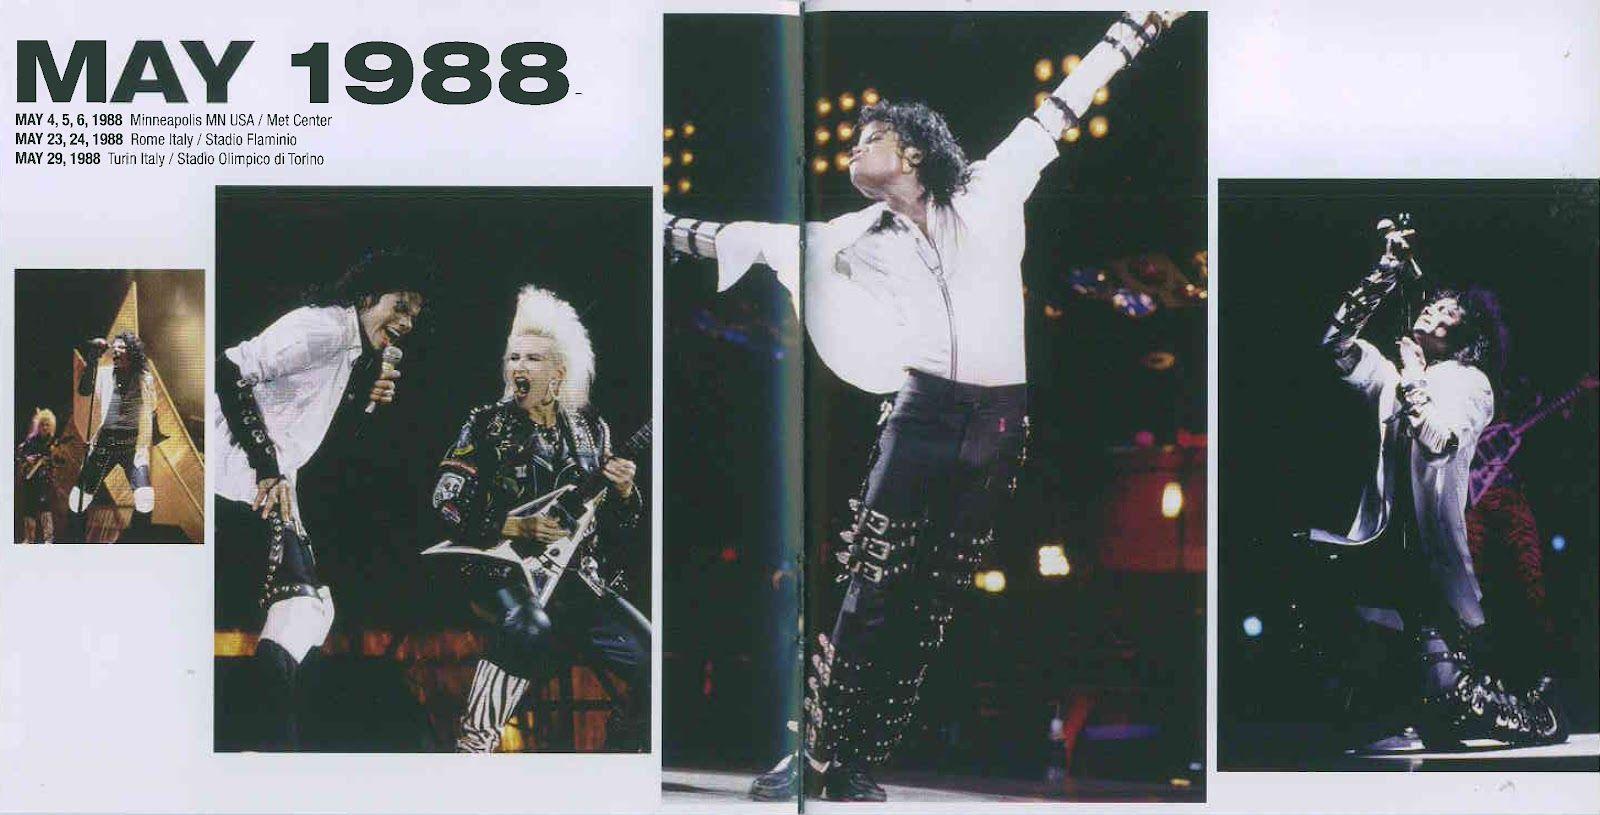 Bad 25 booklet